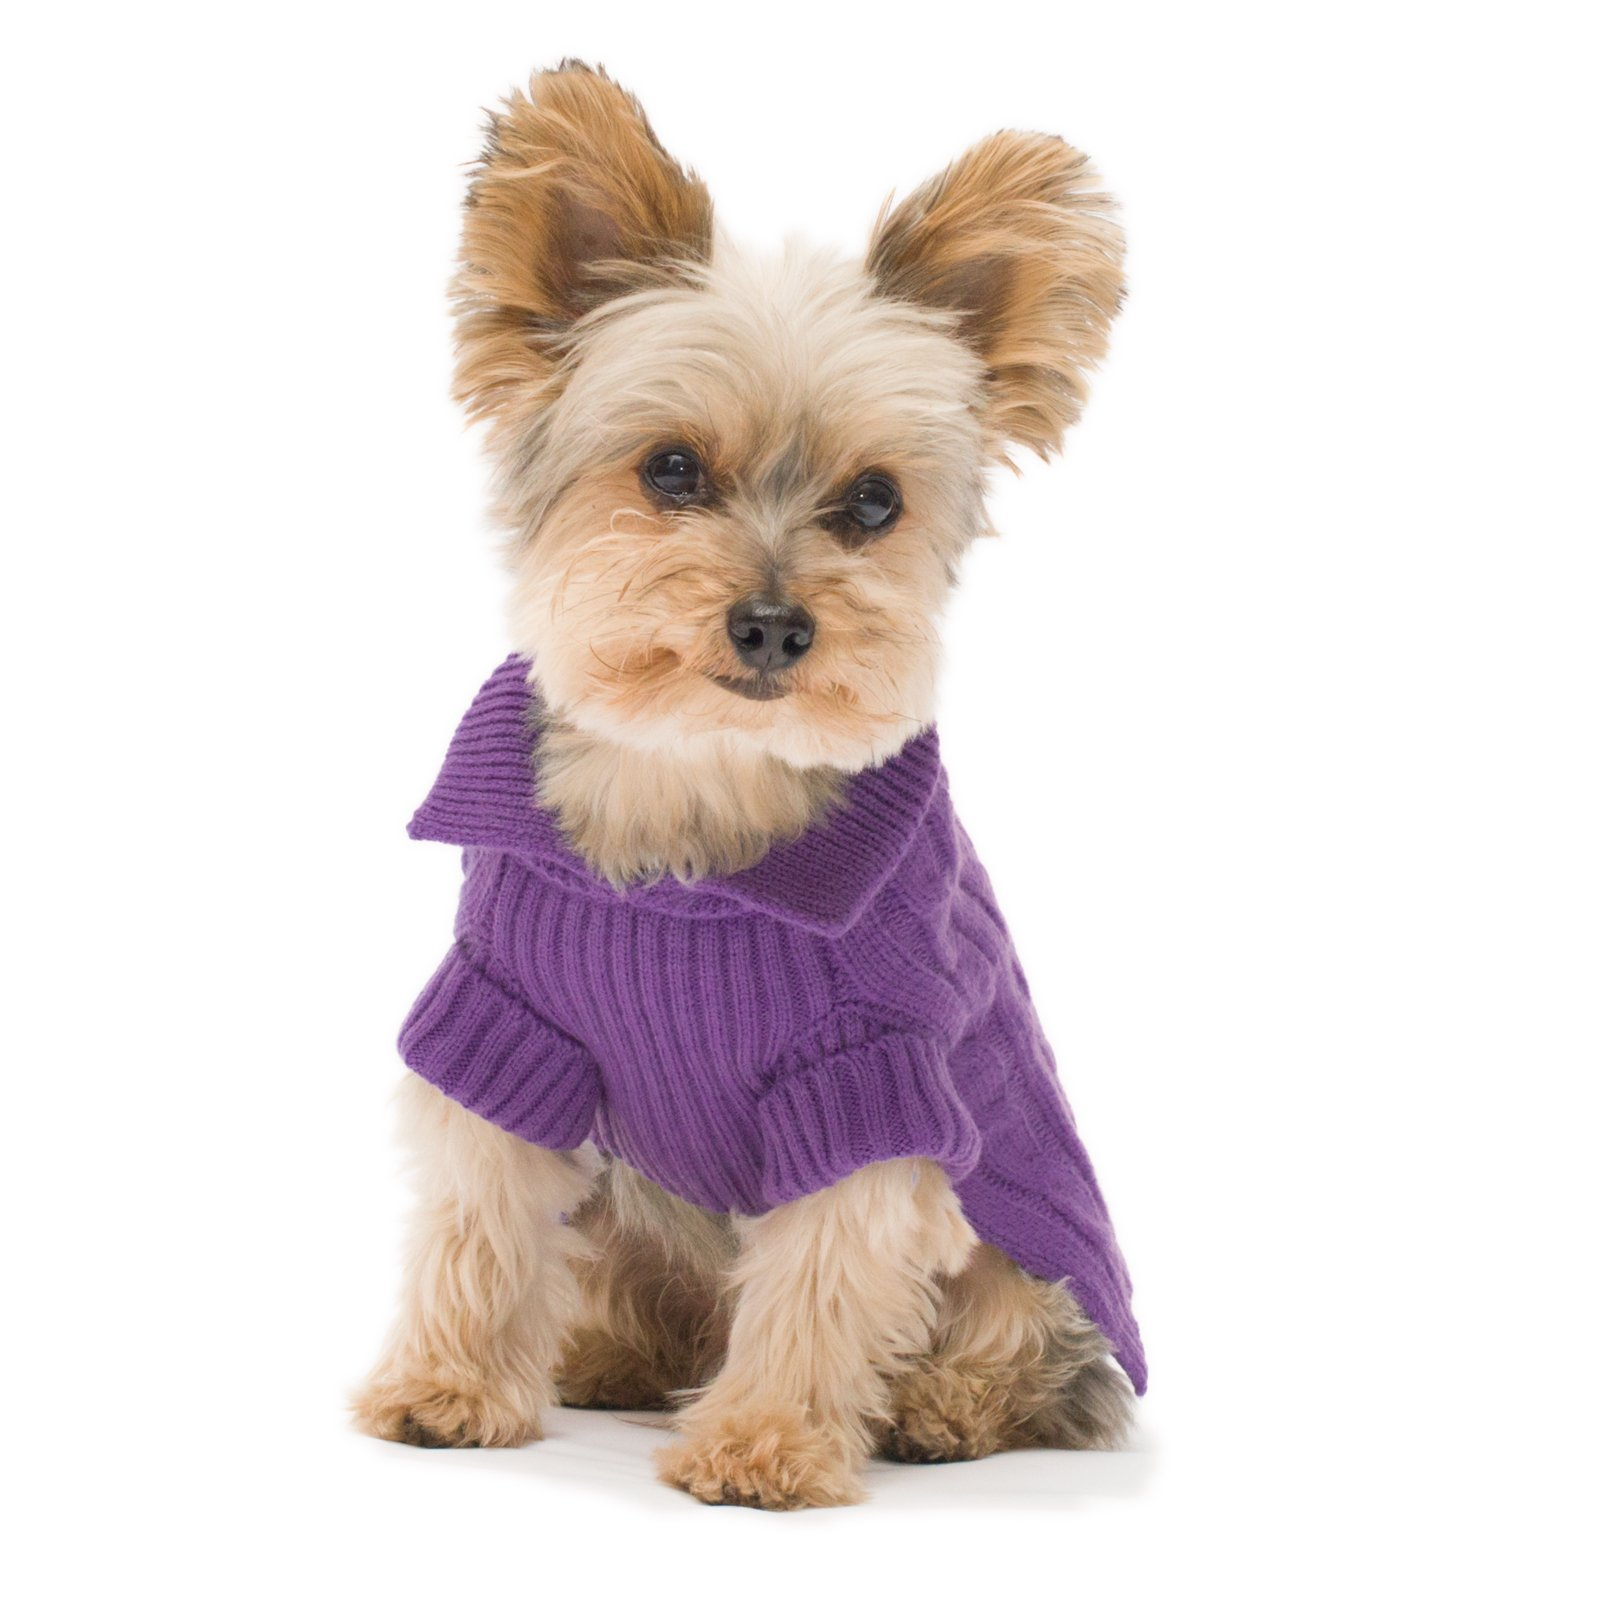 Stinky G Violet Aran Dog Sweater Size #12 Medium by Stinky G